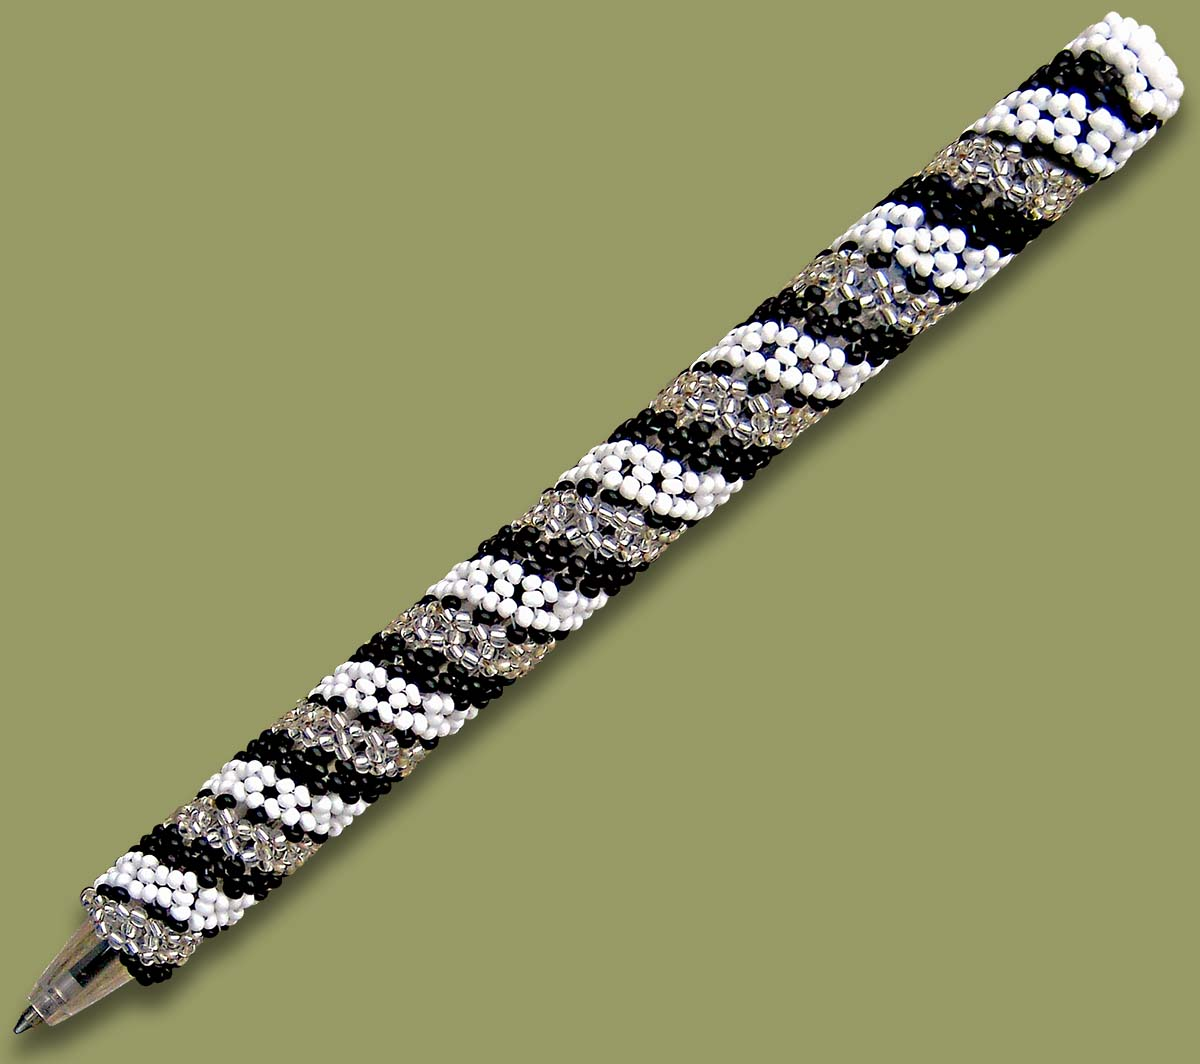 African Beaded Pen Spiral White Black Silver